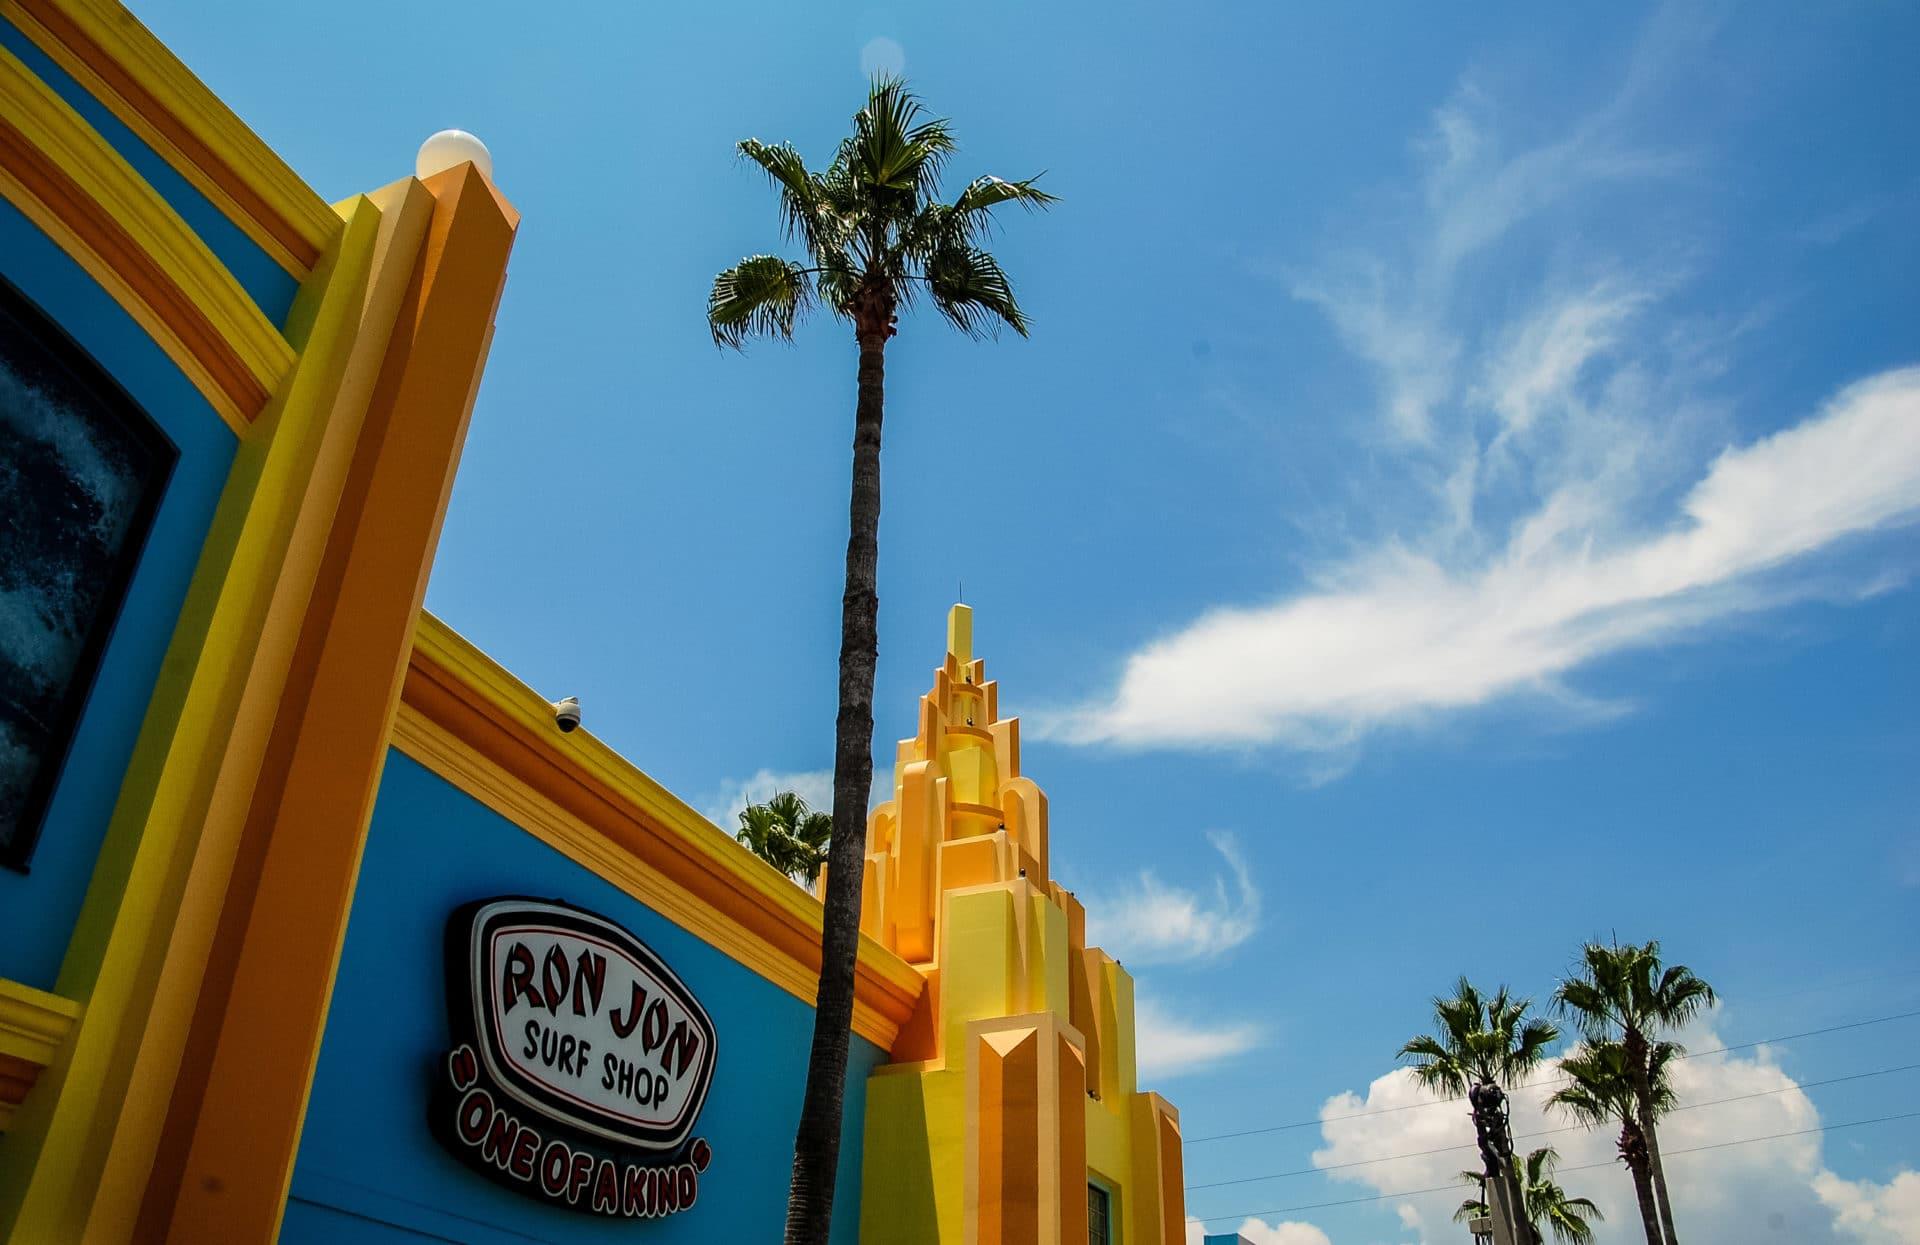 Ron Jon Cocoa beach